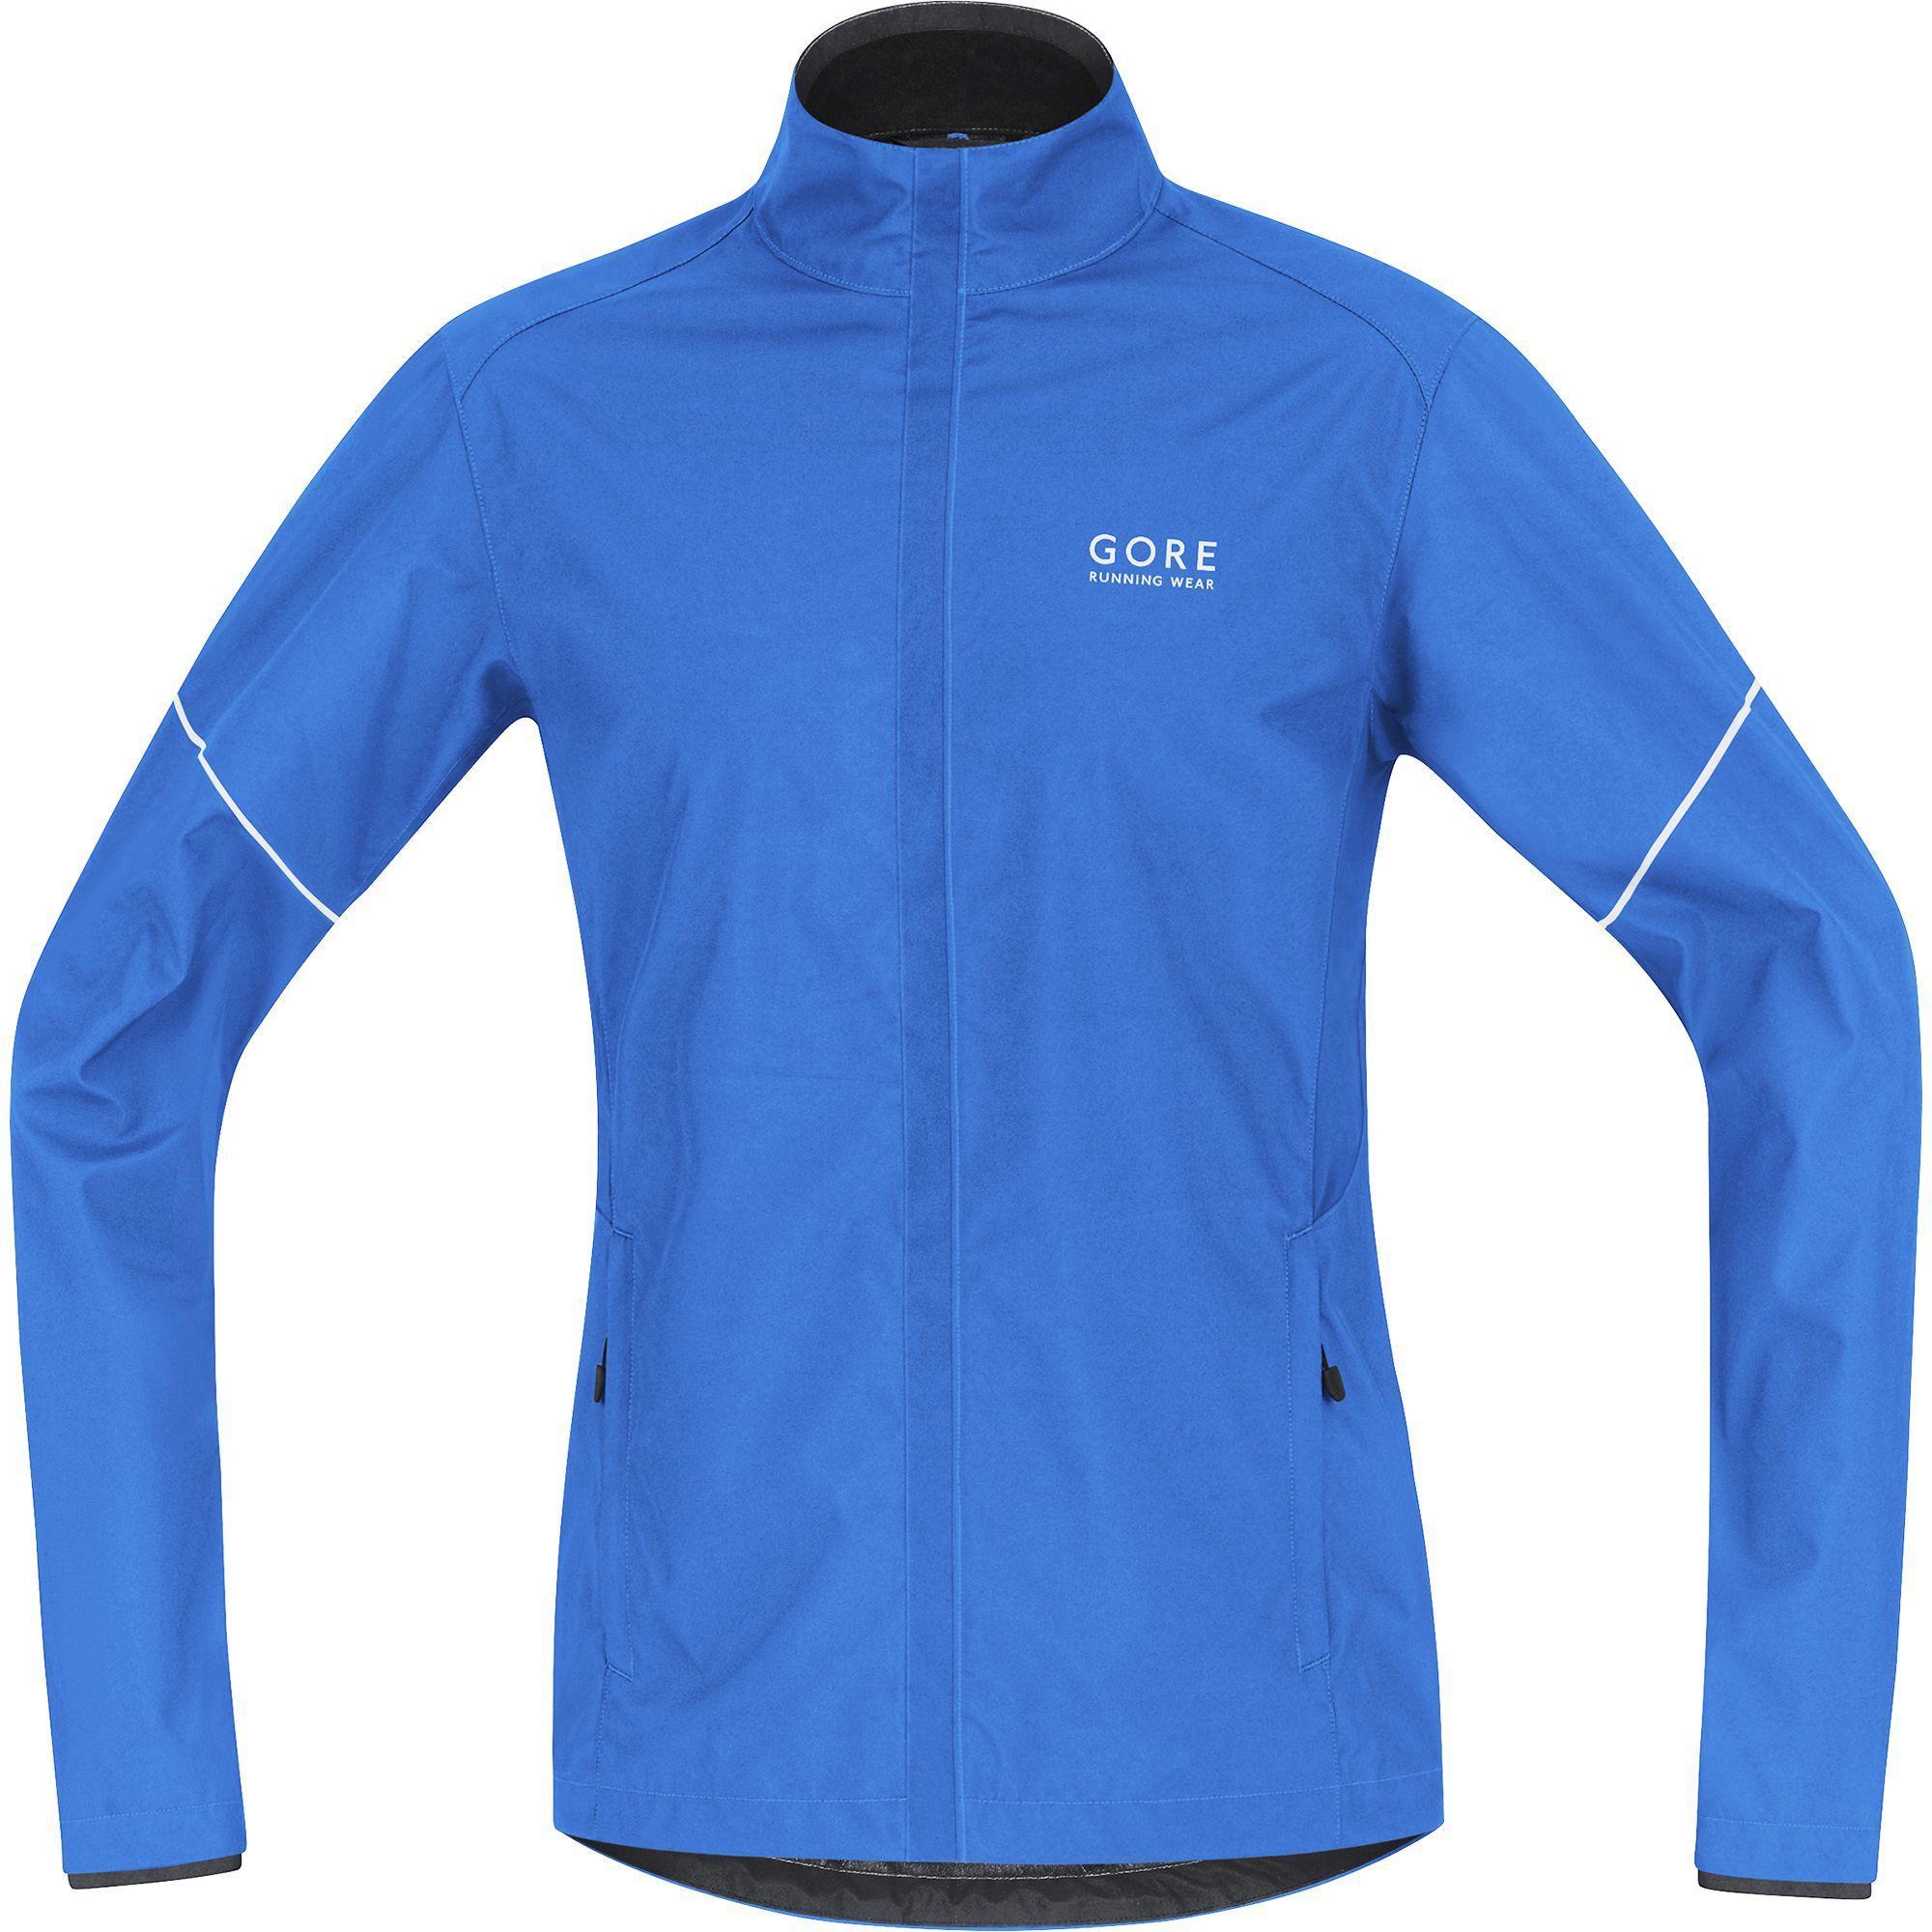 e32f848f Best pris på Gore Running Wear Essential Windstopper Partial (herre) - Se  priser før kjøp i Prisguiden